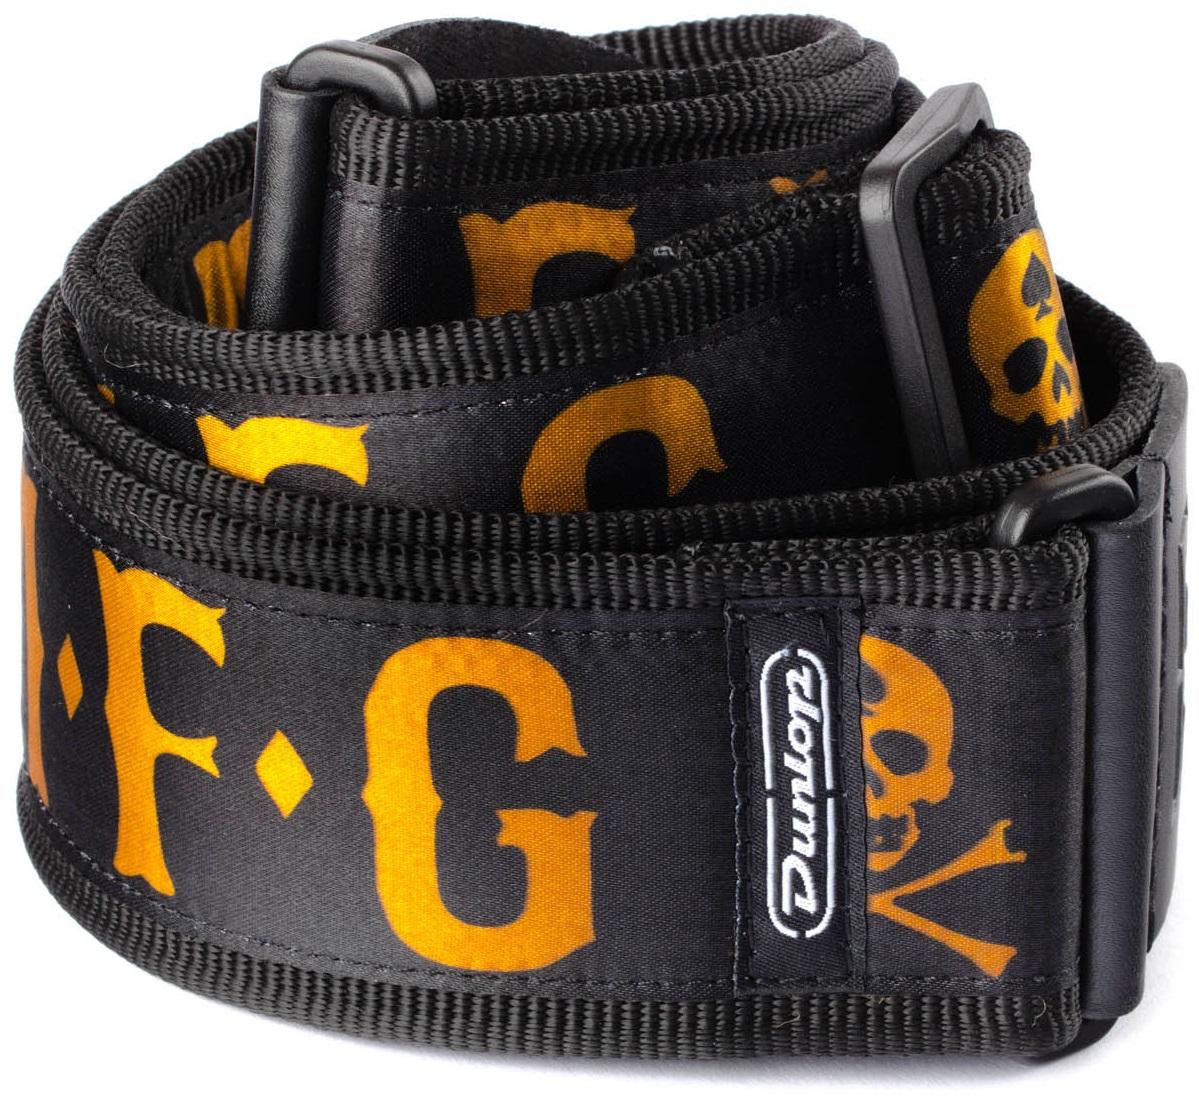 Dunlop Lucky 13 Strap MFG GFY